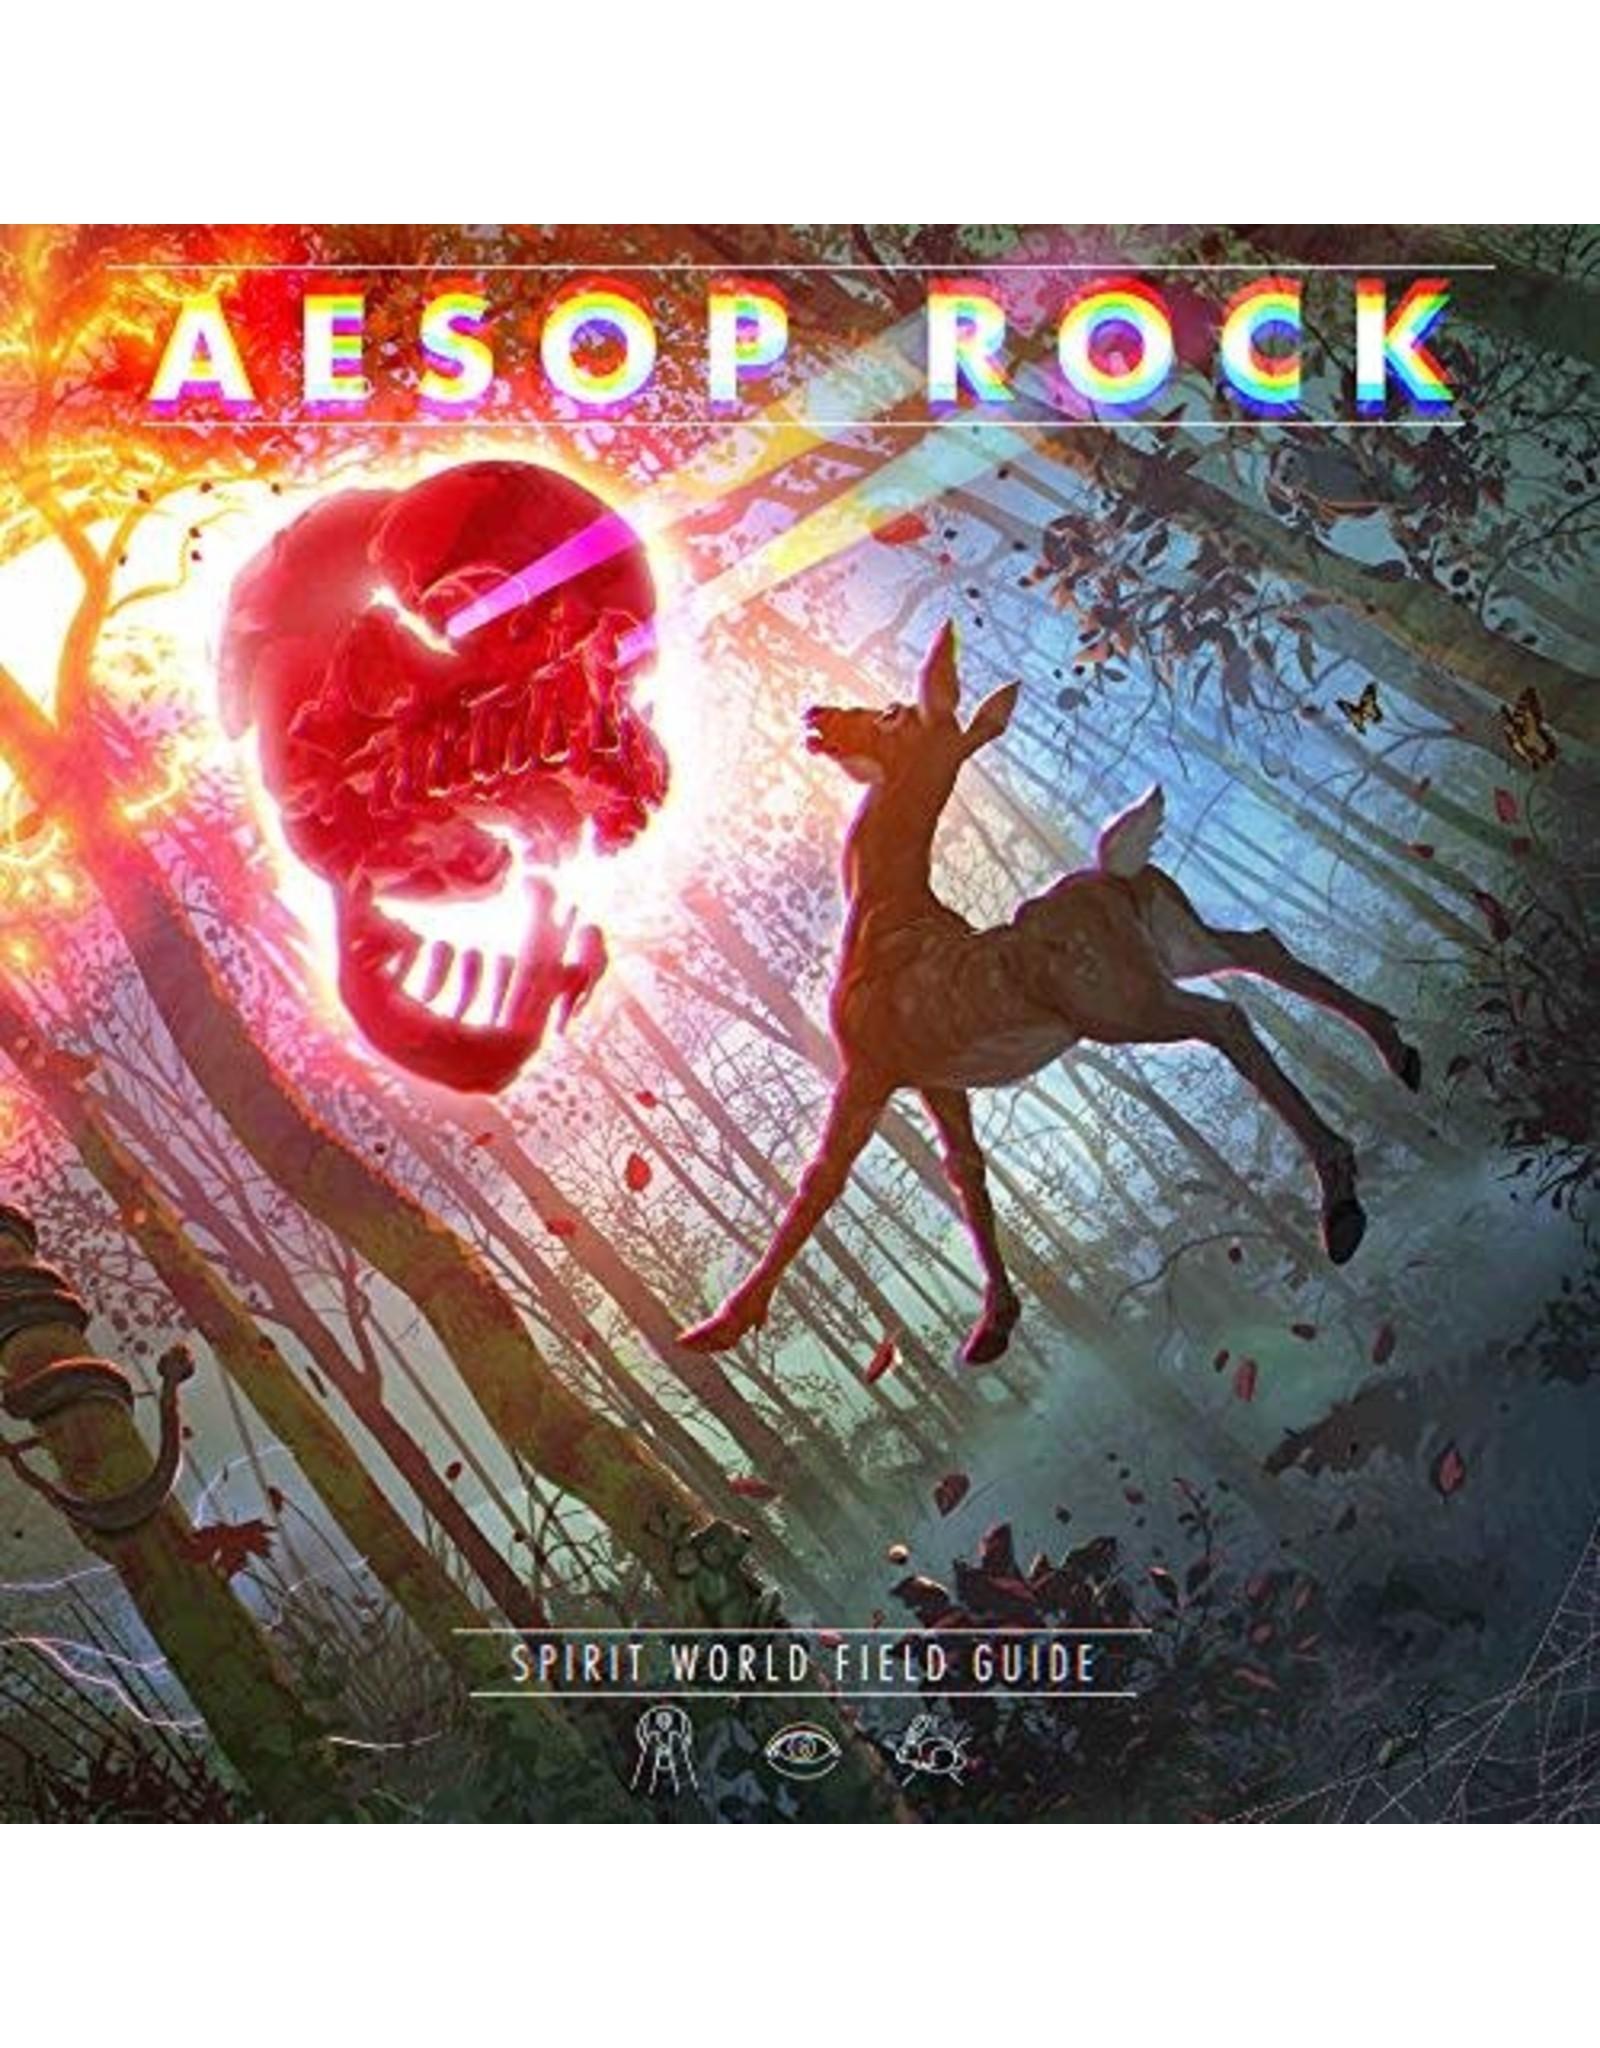 Aesop Rock - Spirit World Field Guide CD